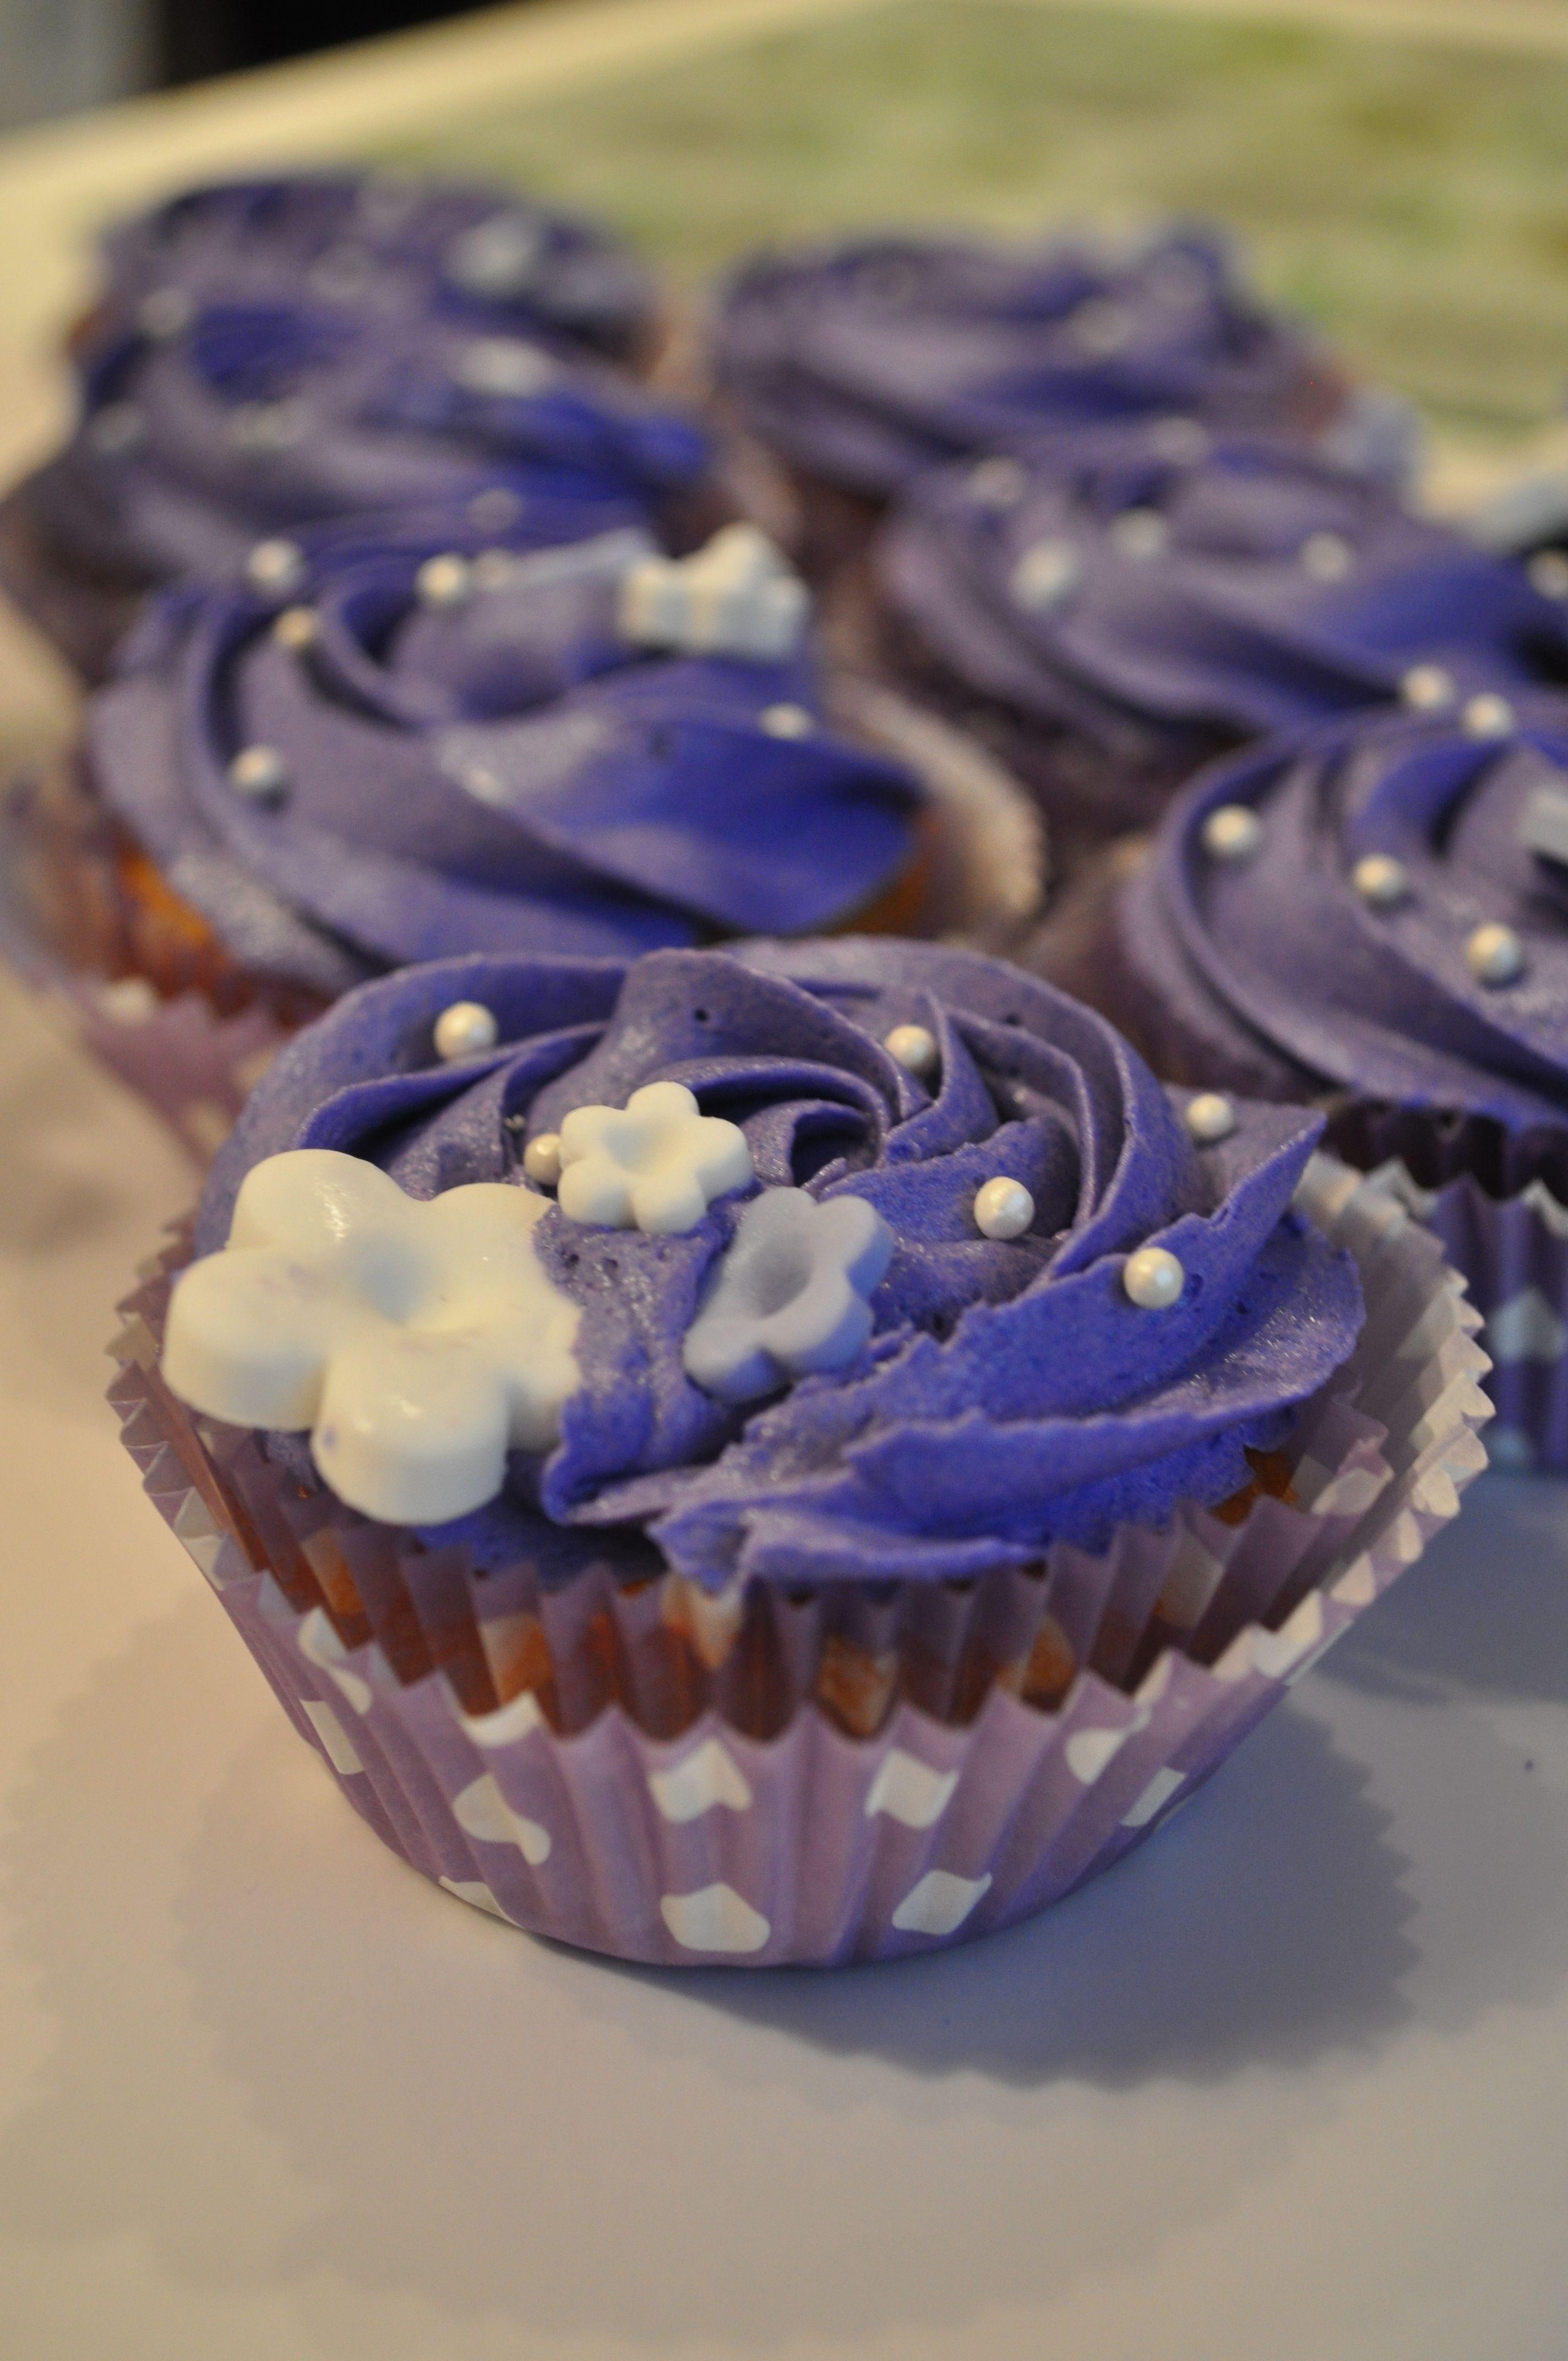 Cute violet cupcakes